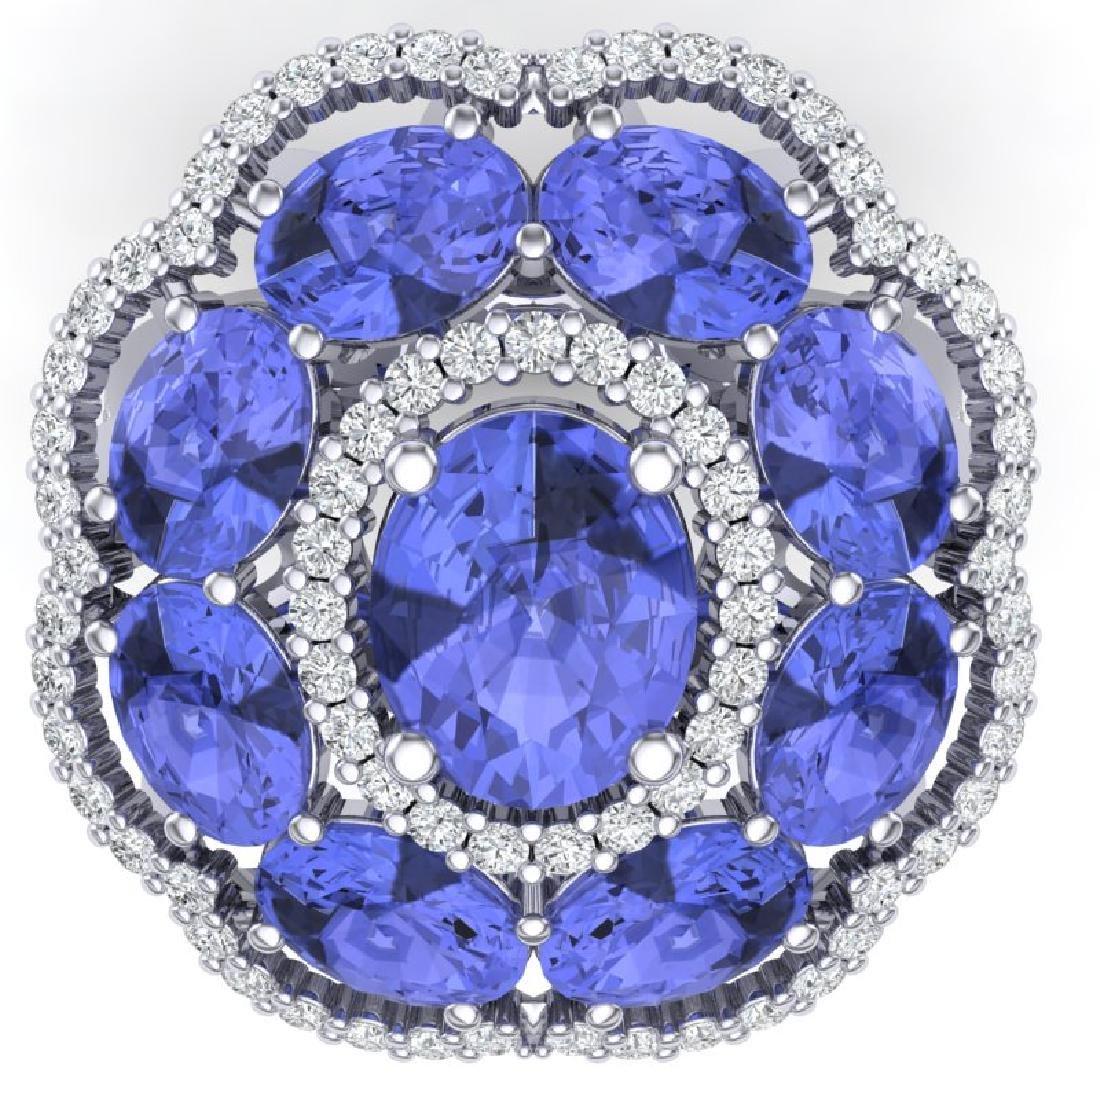 15.24 CTW Royalty Tanzanite & VS Diamond Ring 18K White - 2